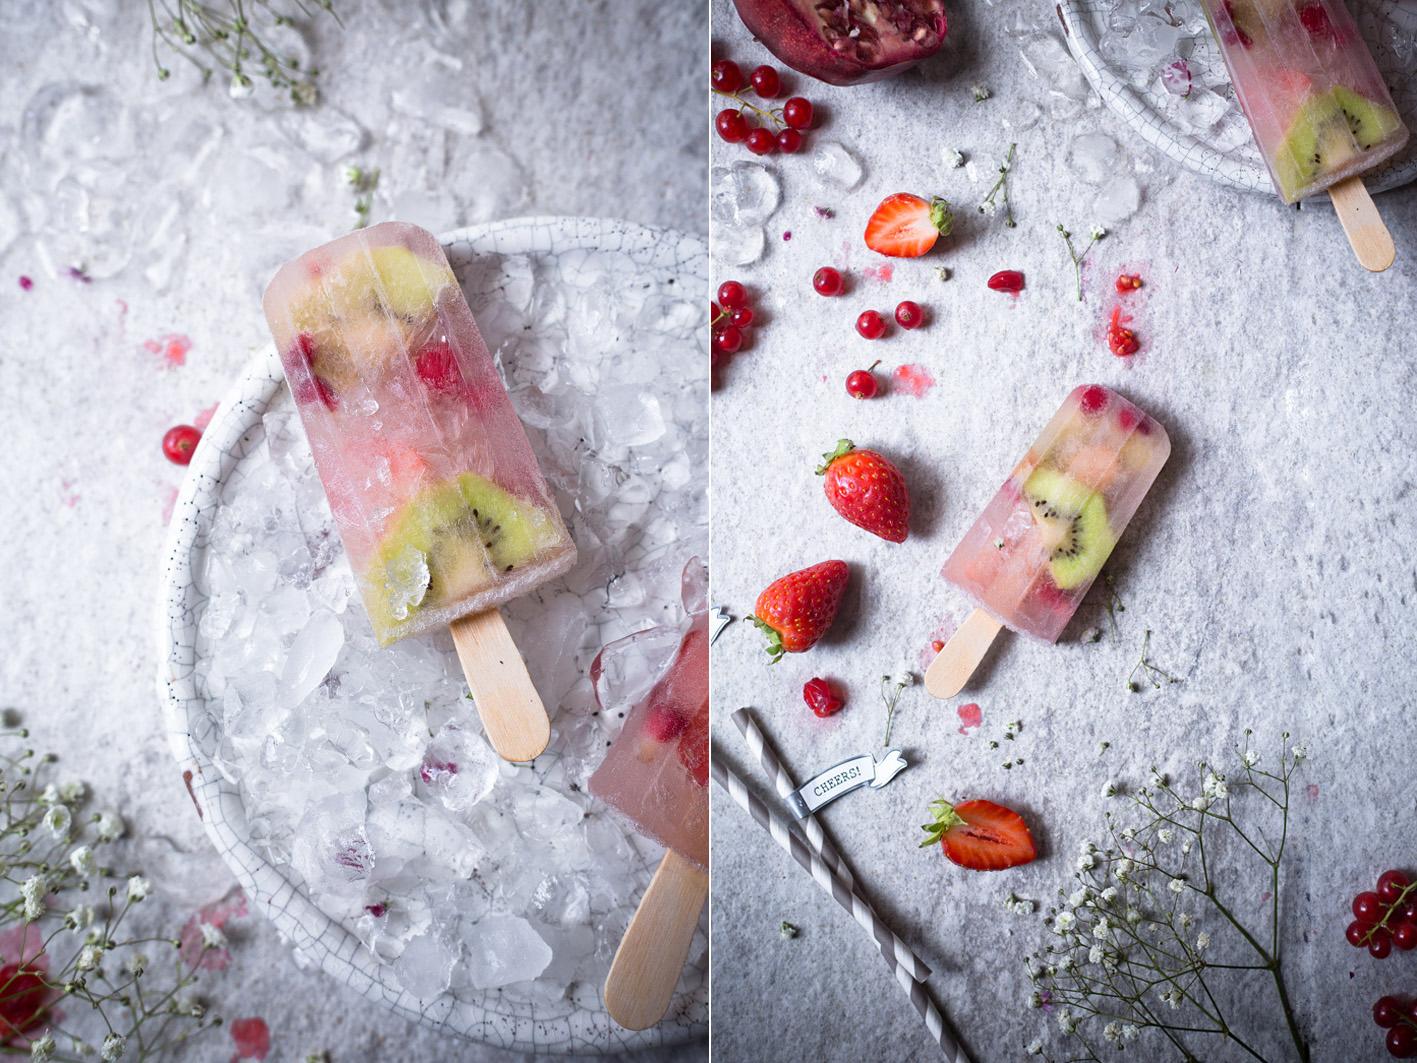 Champagner Eis Popsicles